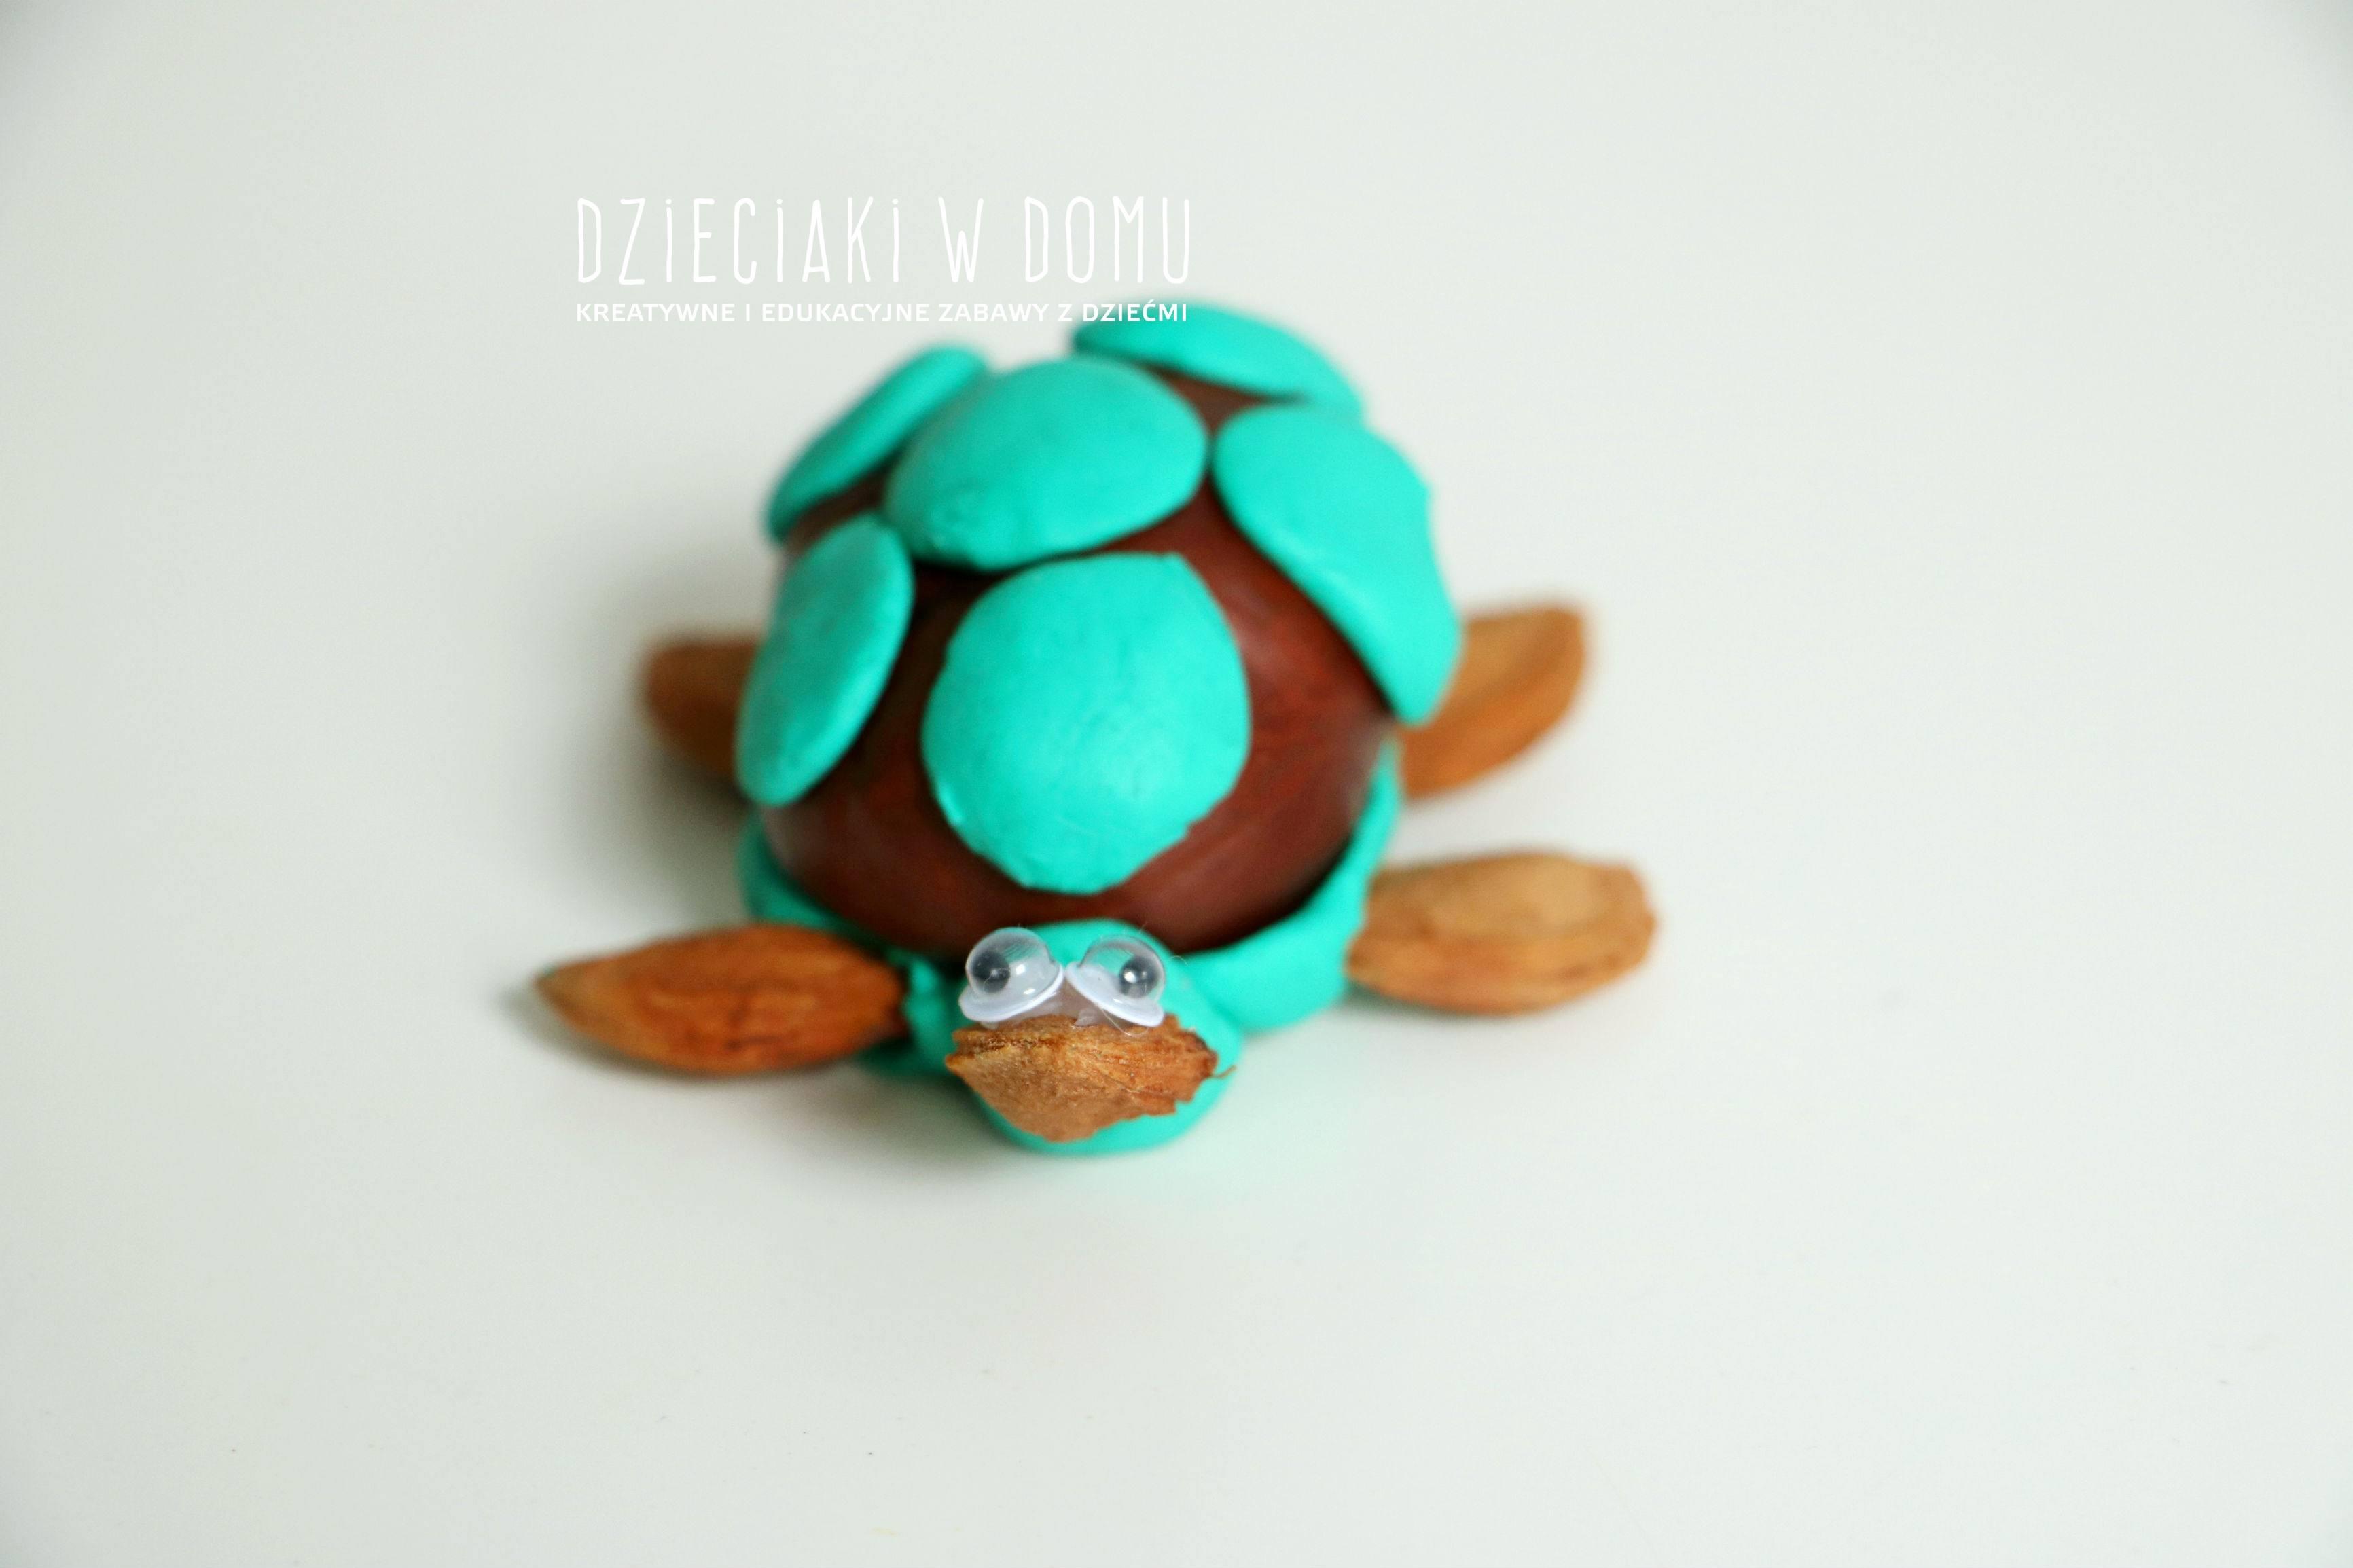 راز عمر بلند لاکپشت و عمر کوتاه مگس